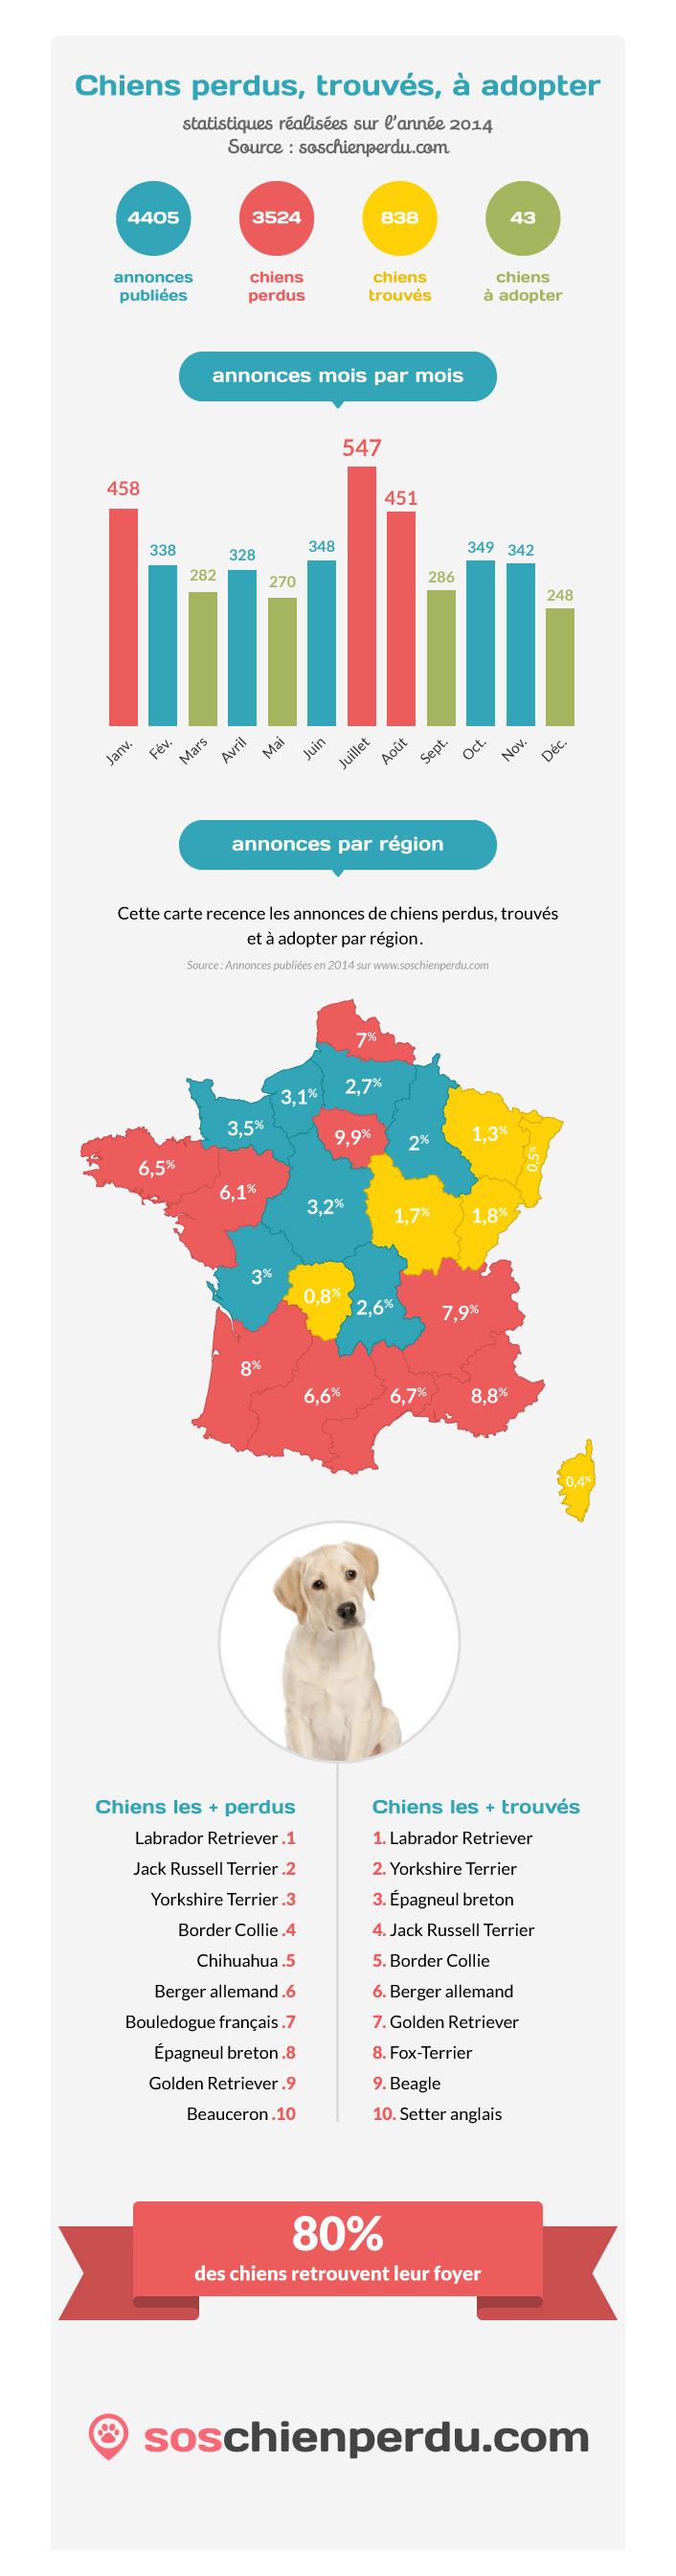 infographie_chiens_perdus_2014